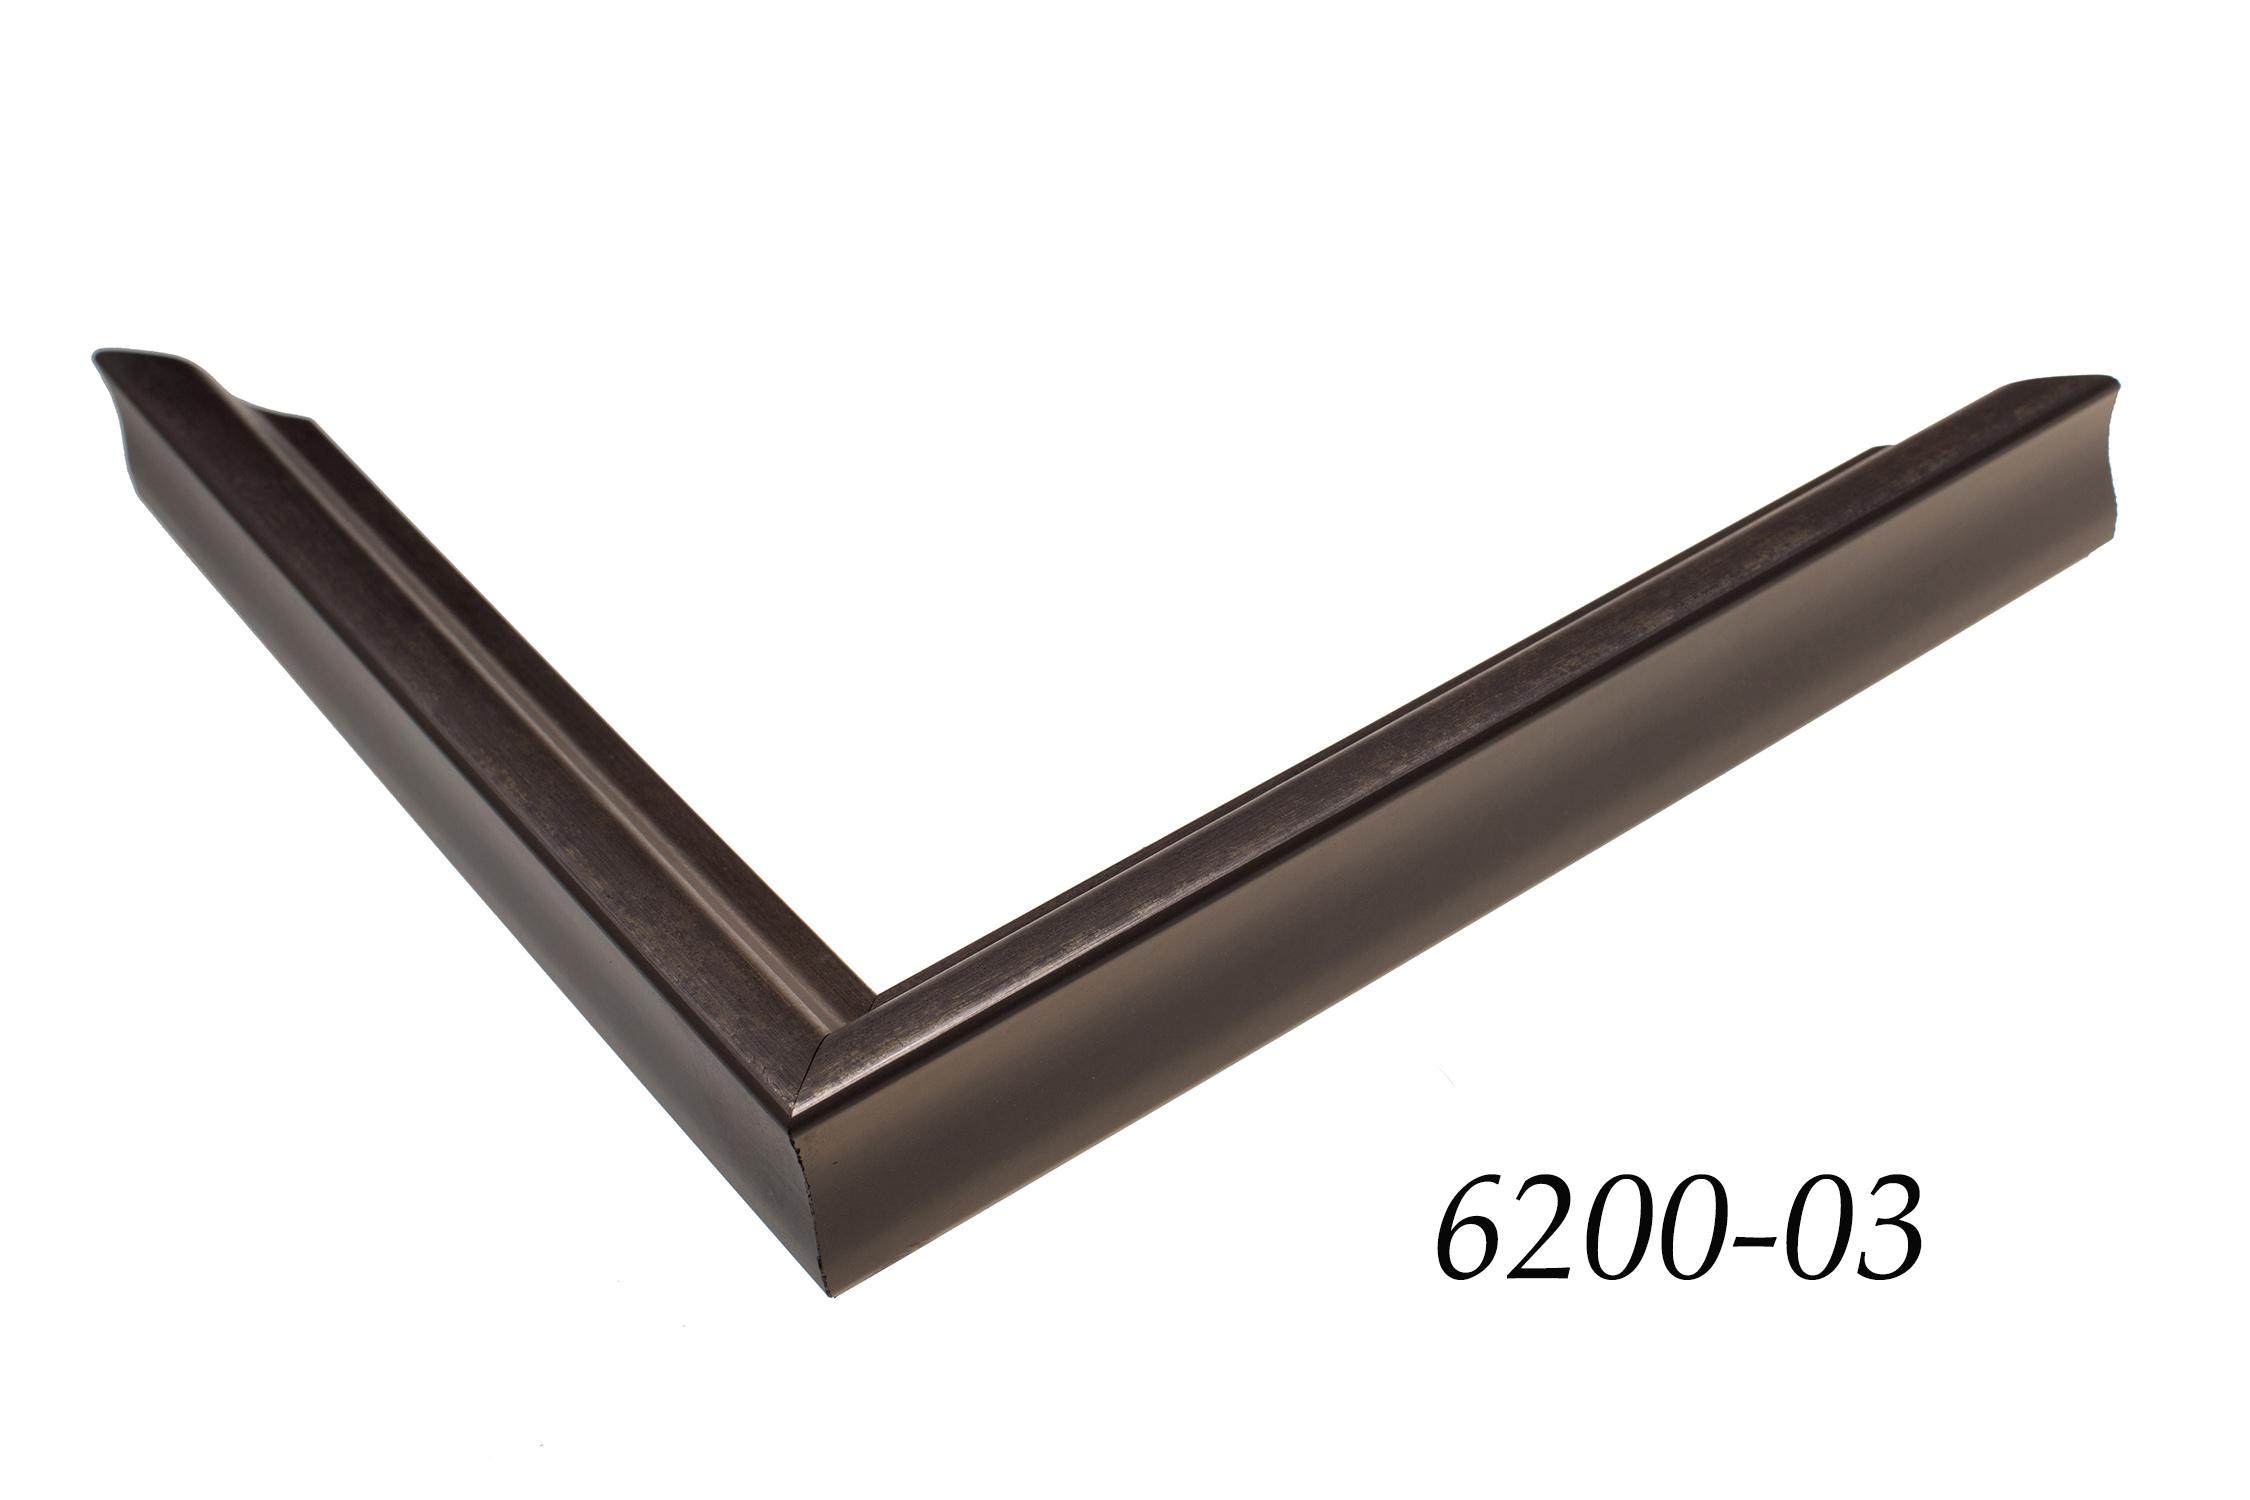 6200-03